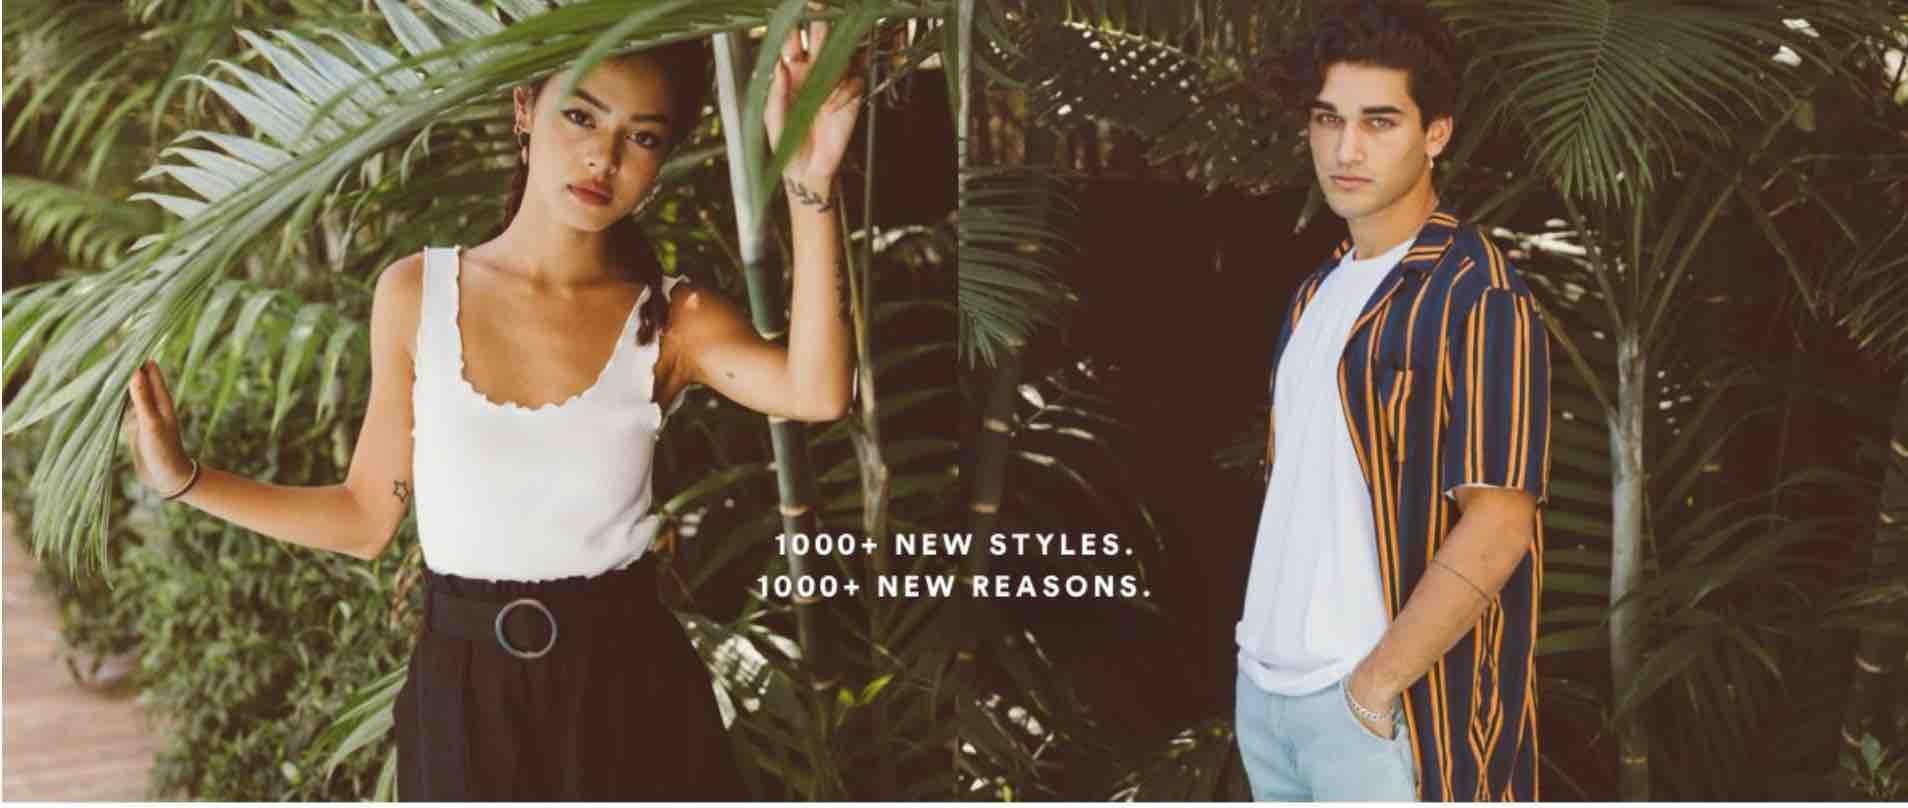 1000+ New Styles